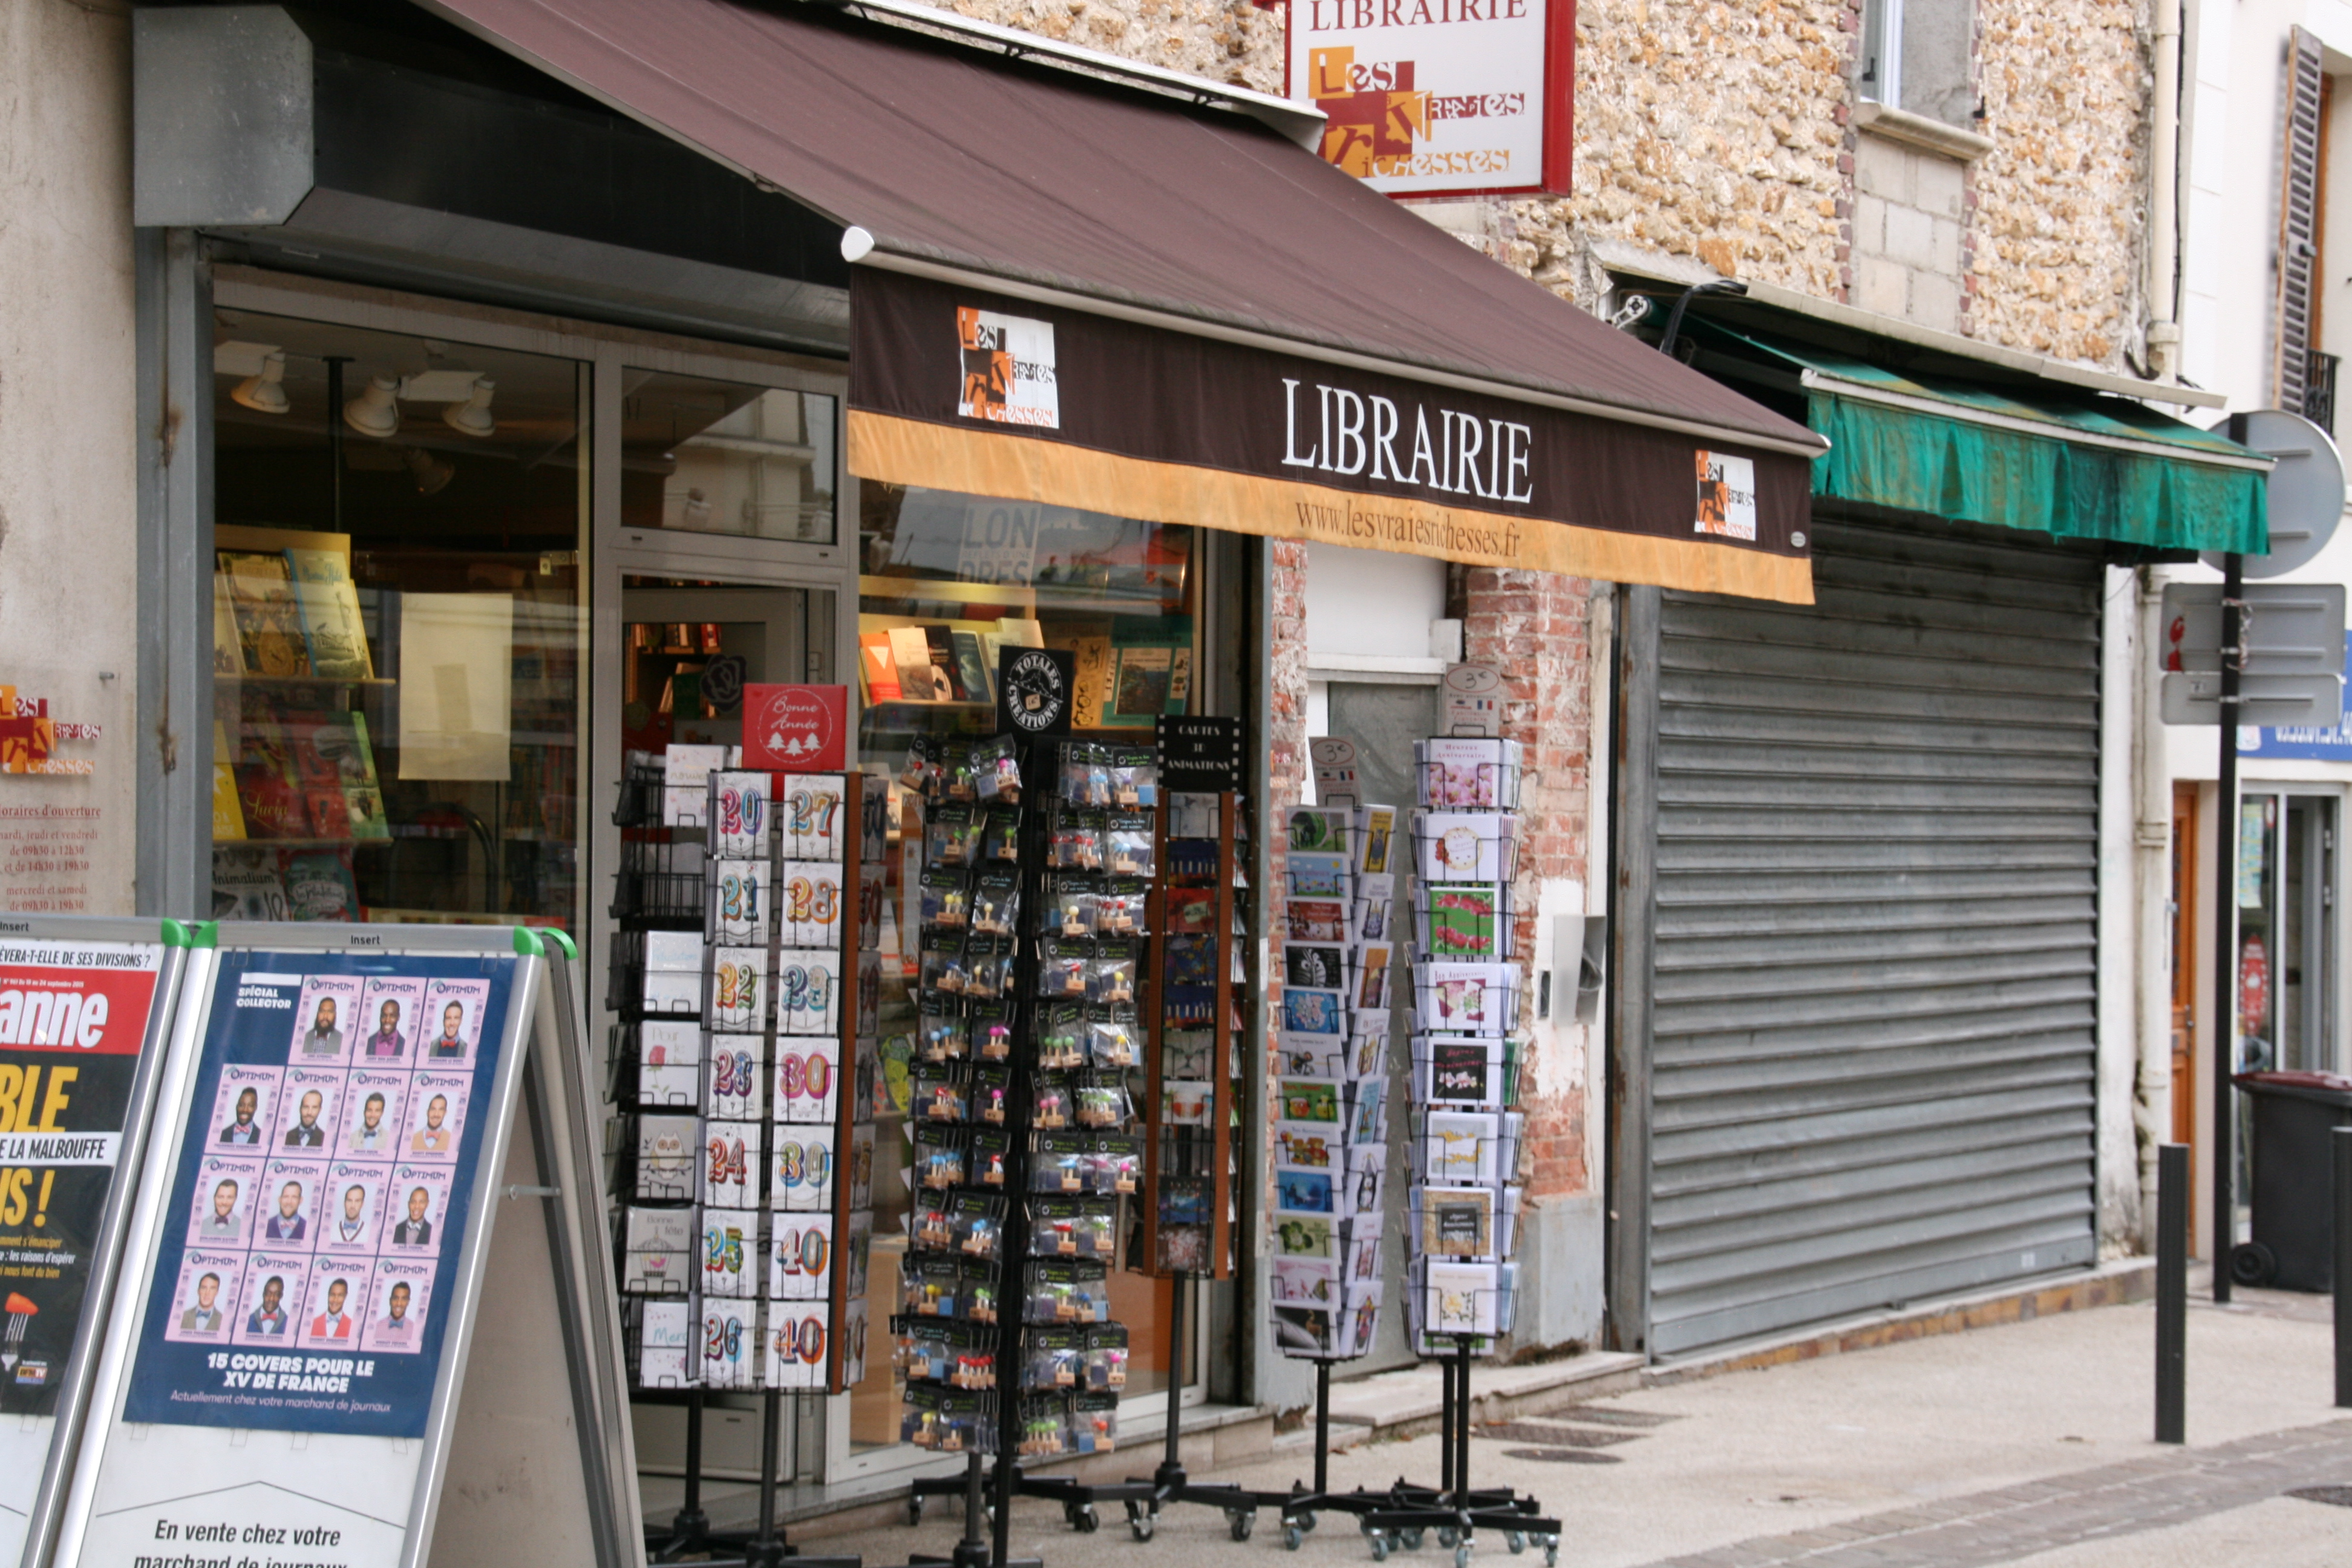 La vitrine de la librairie 2015 1 for Libraire maison